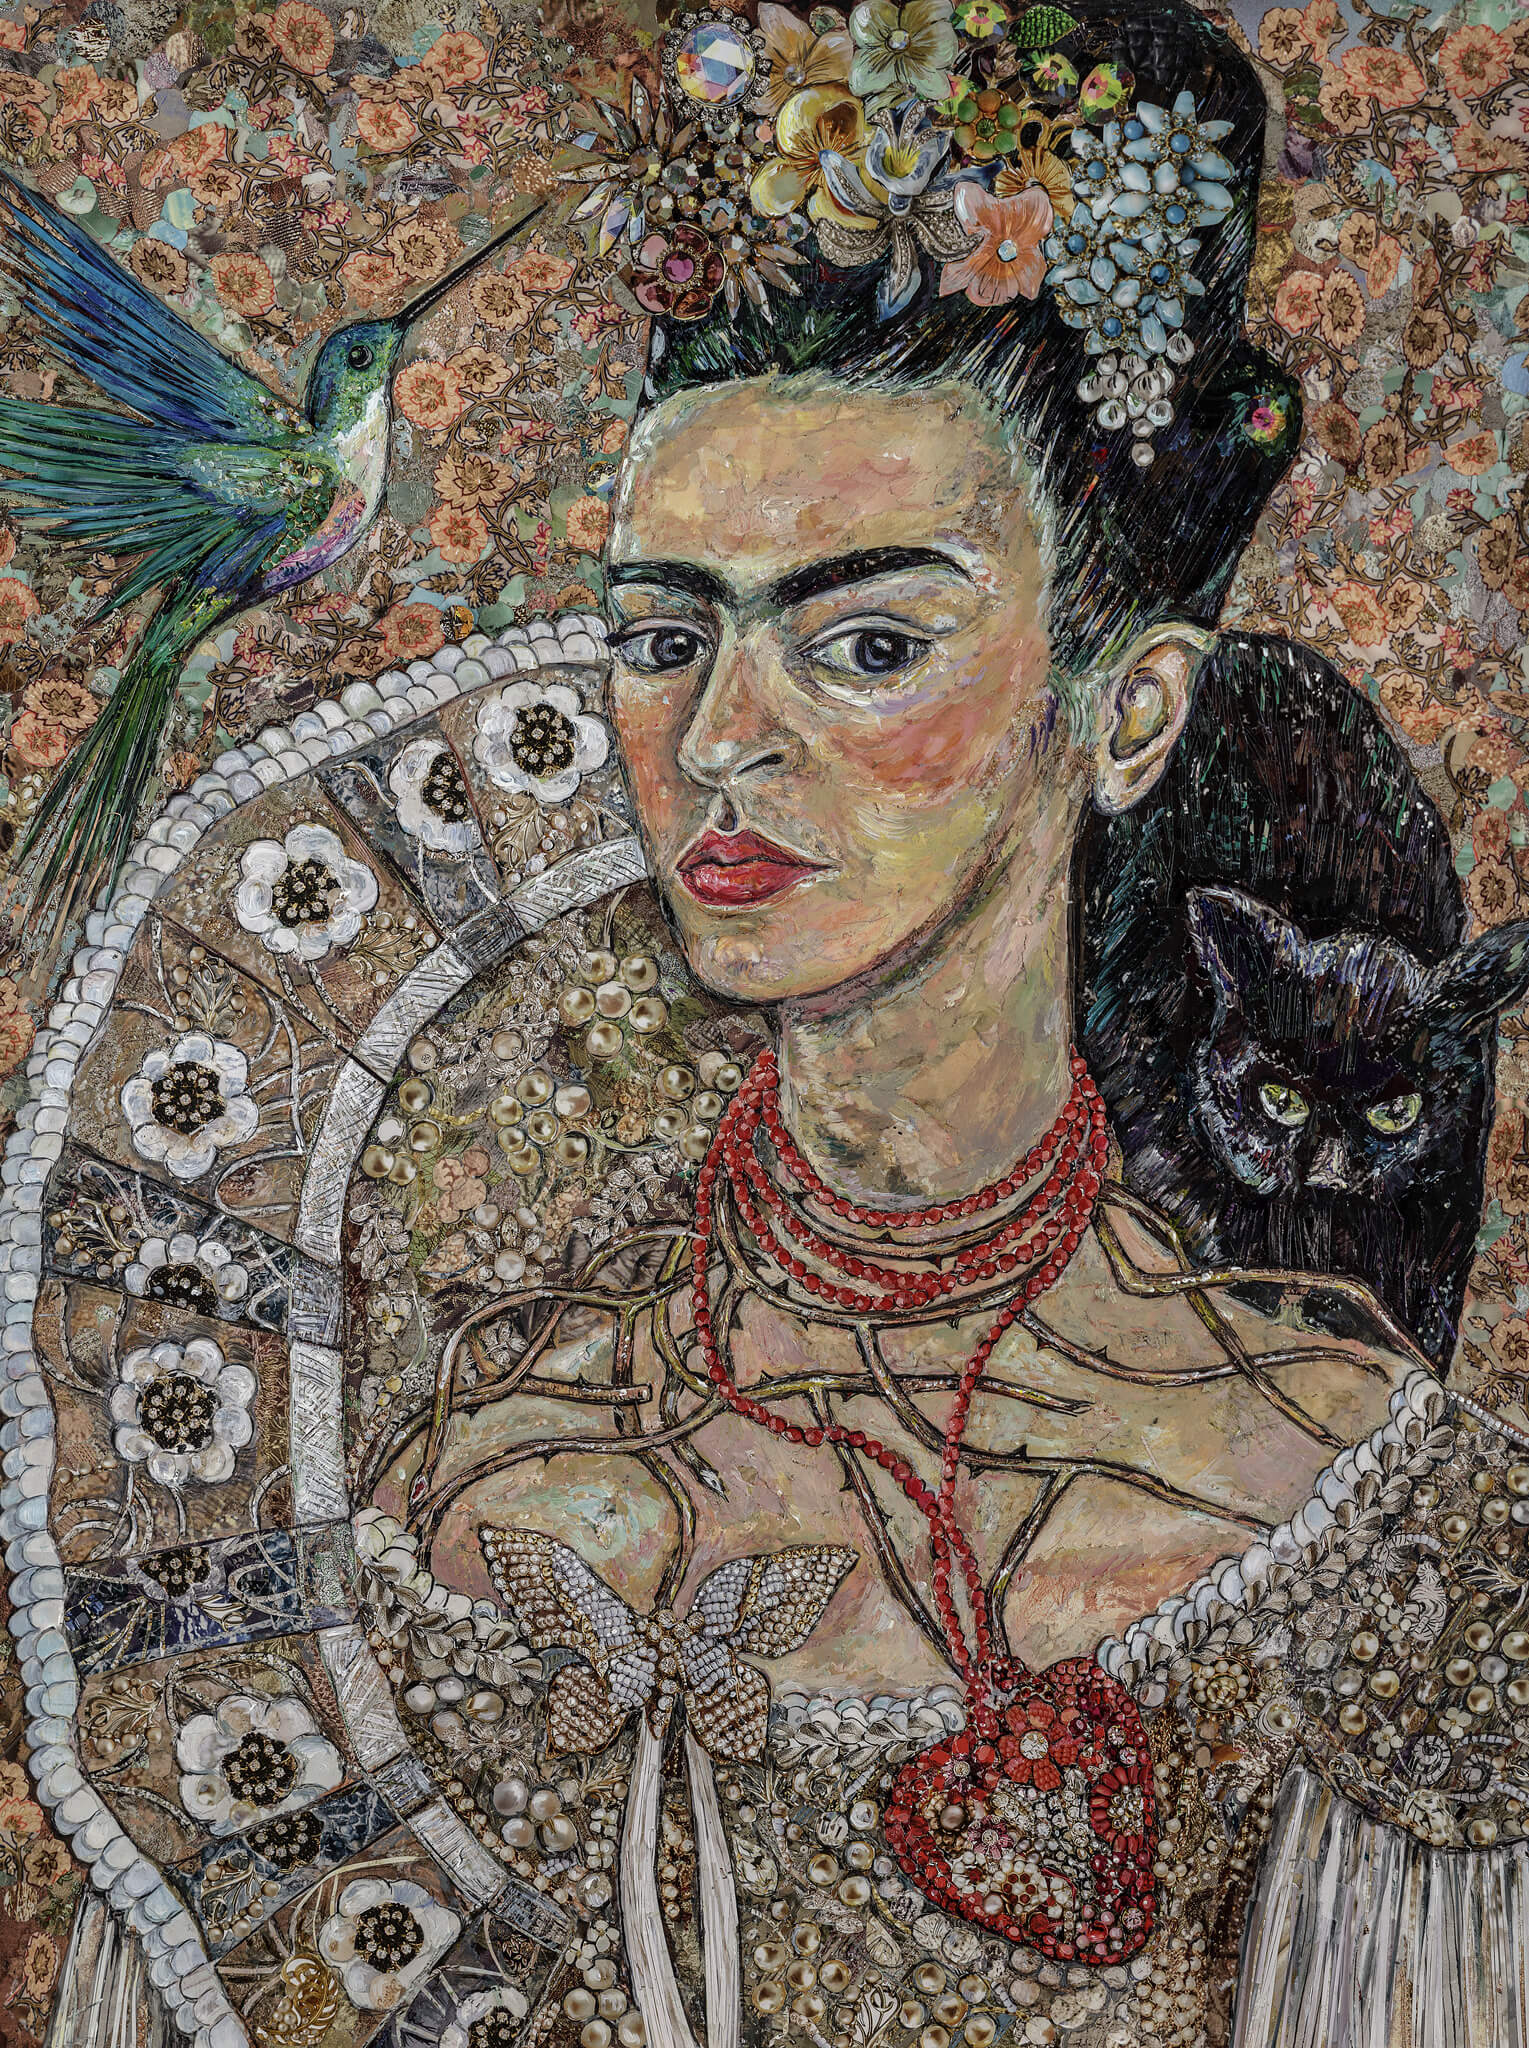 Frida Kahlo – Memories of Pain